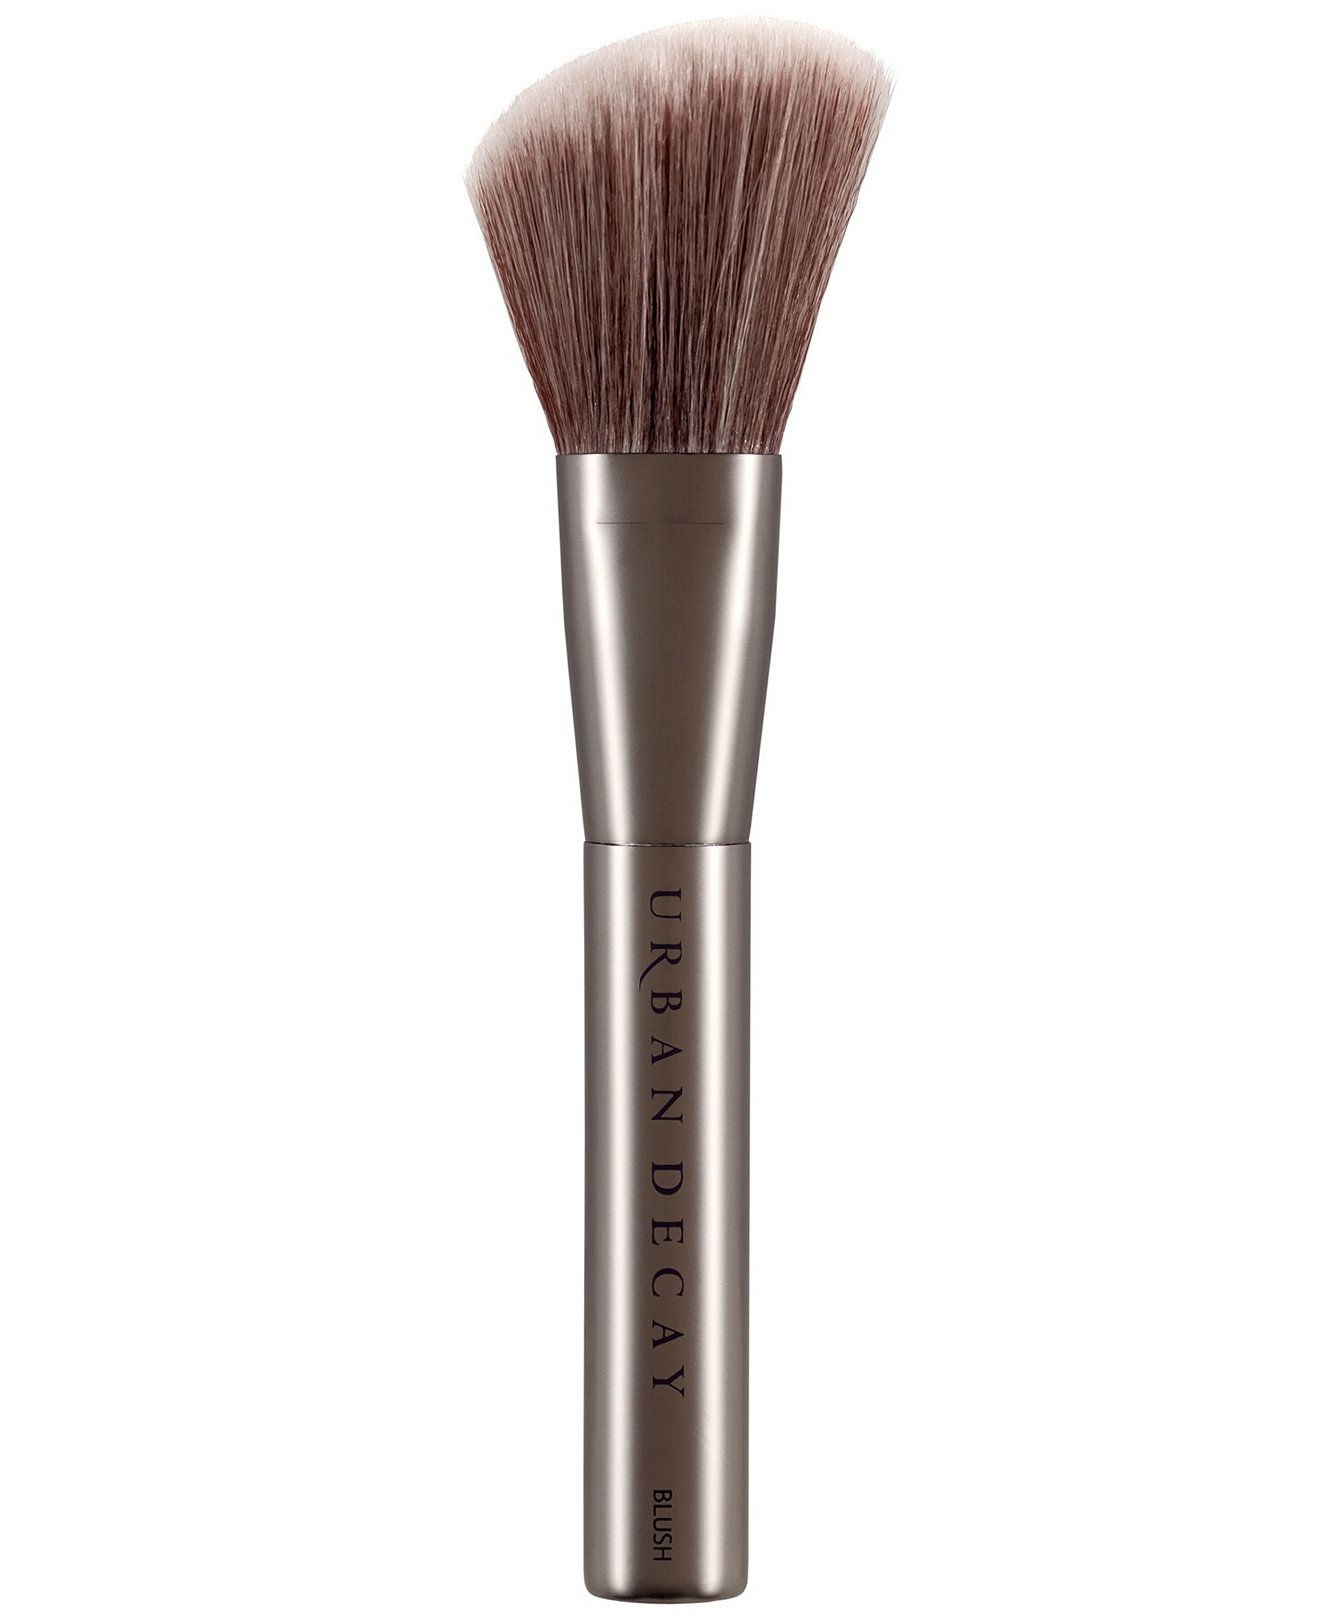 Urban Decay Good Karma Blush Brush Makeup Beauty